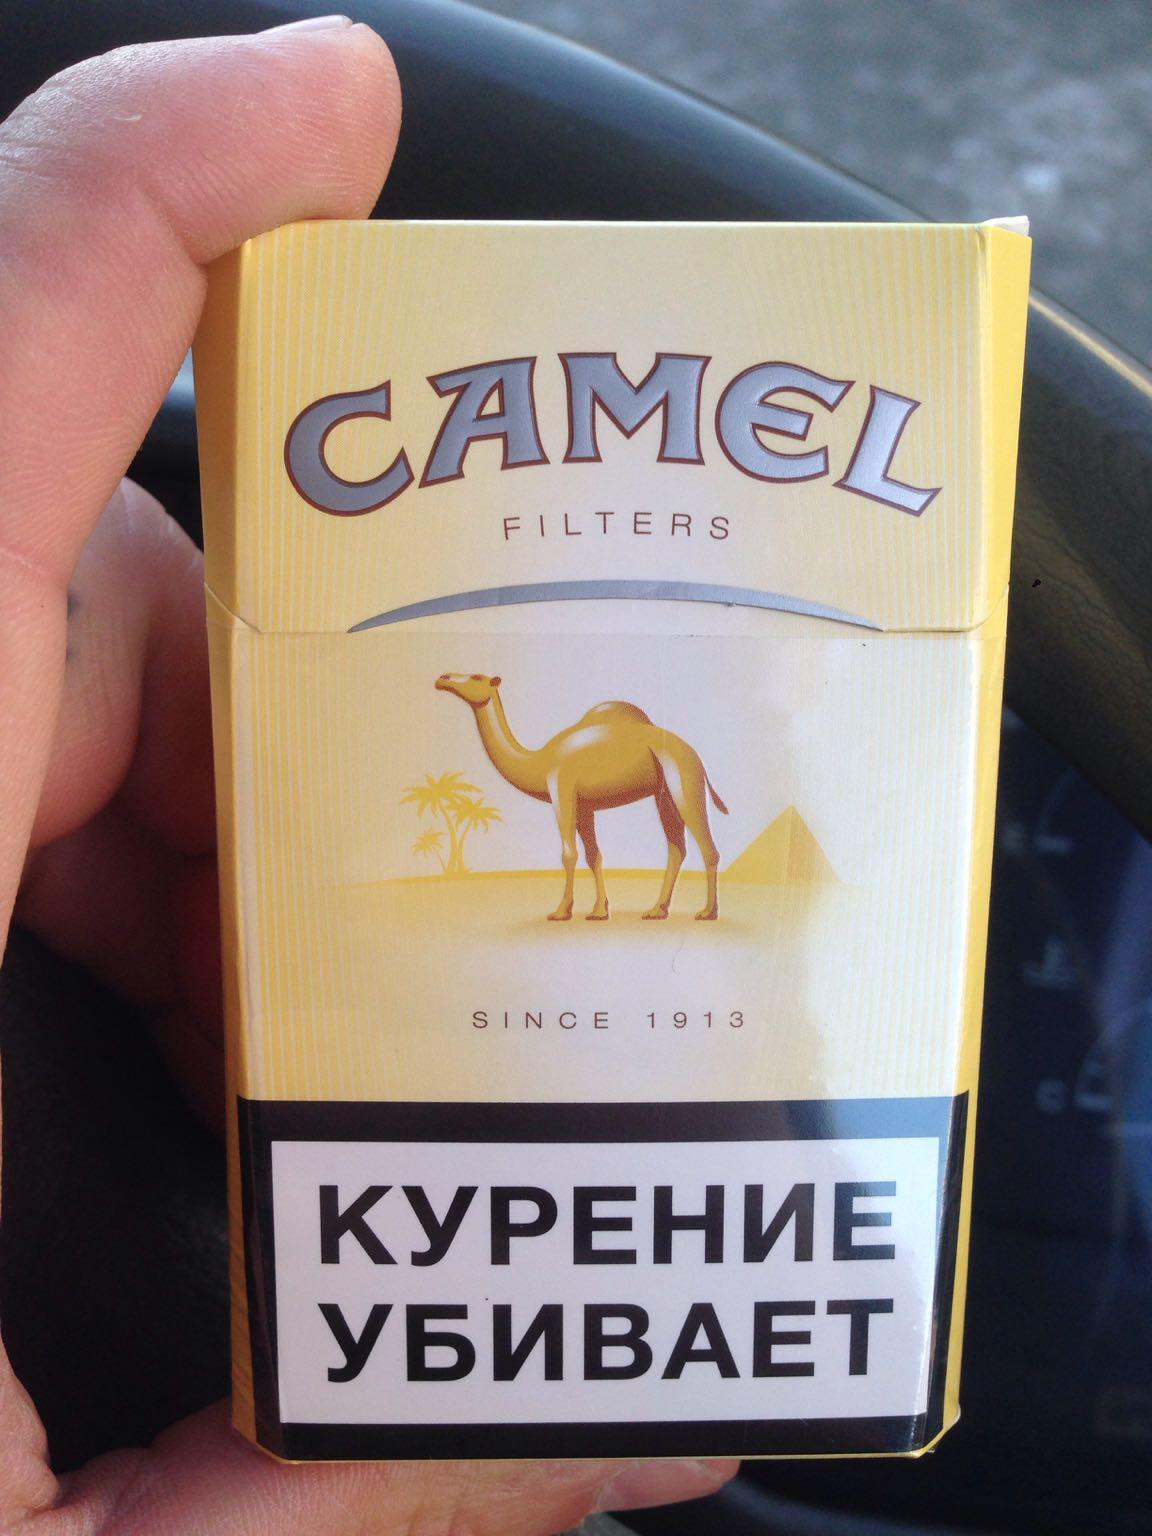 Картинка на сигаретах кэмел